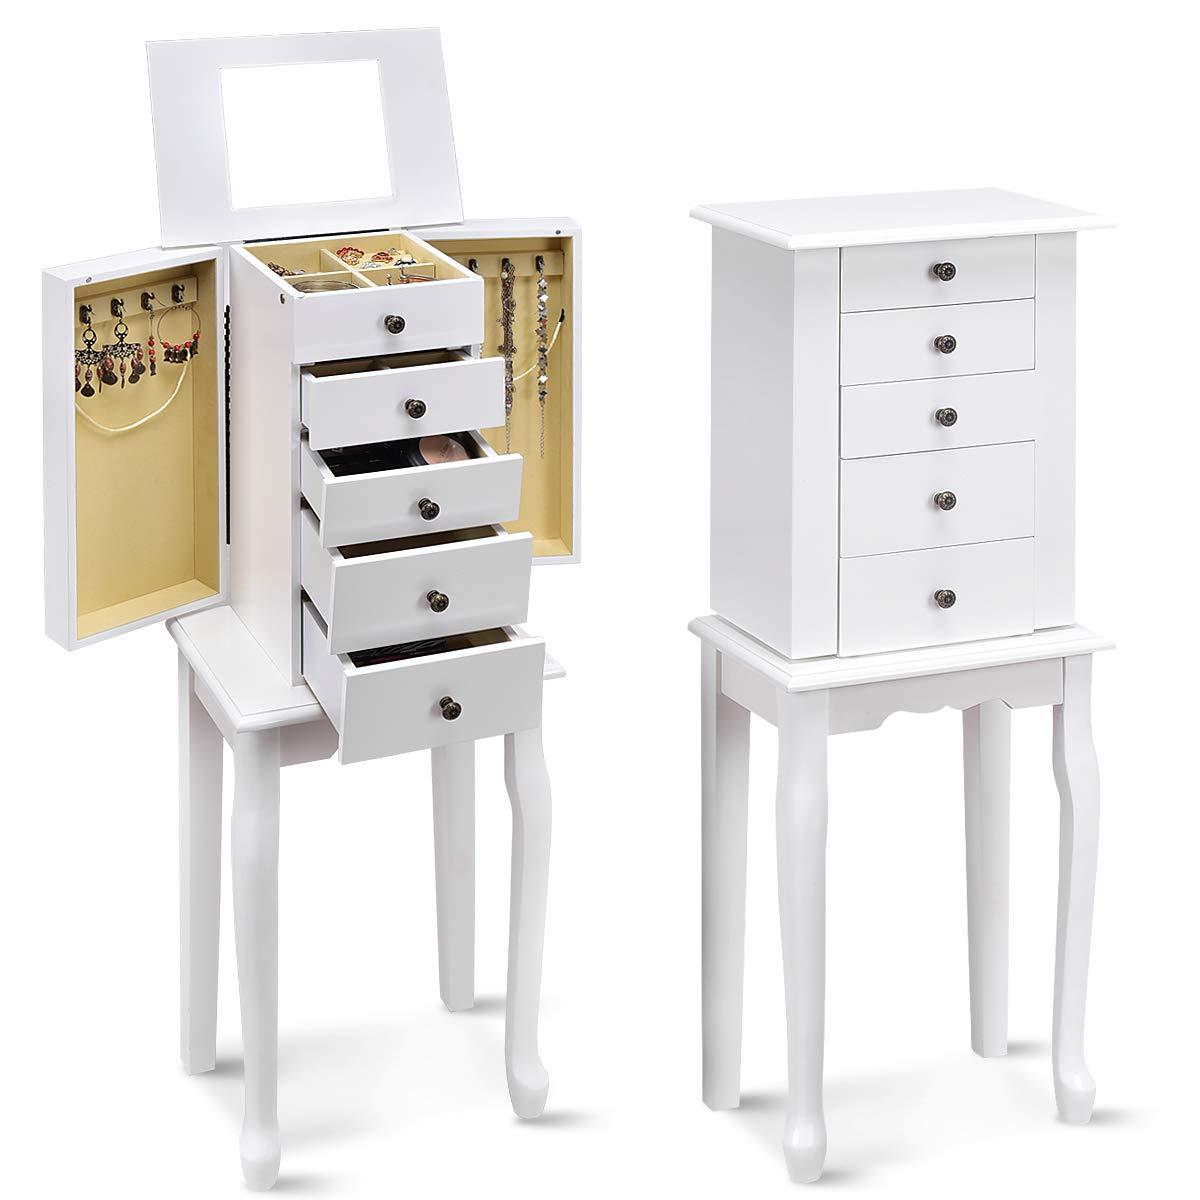 Giantex Jewelry Cabinet Armoire Box Storage Chest Necklace Stand Organizer